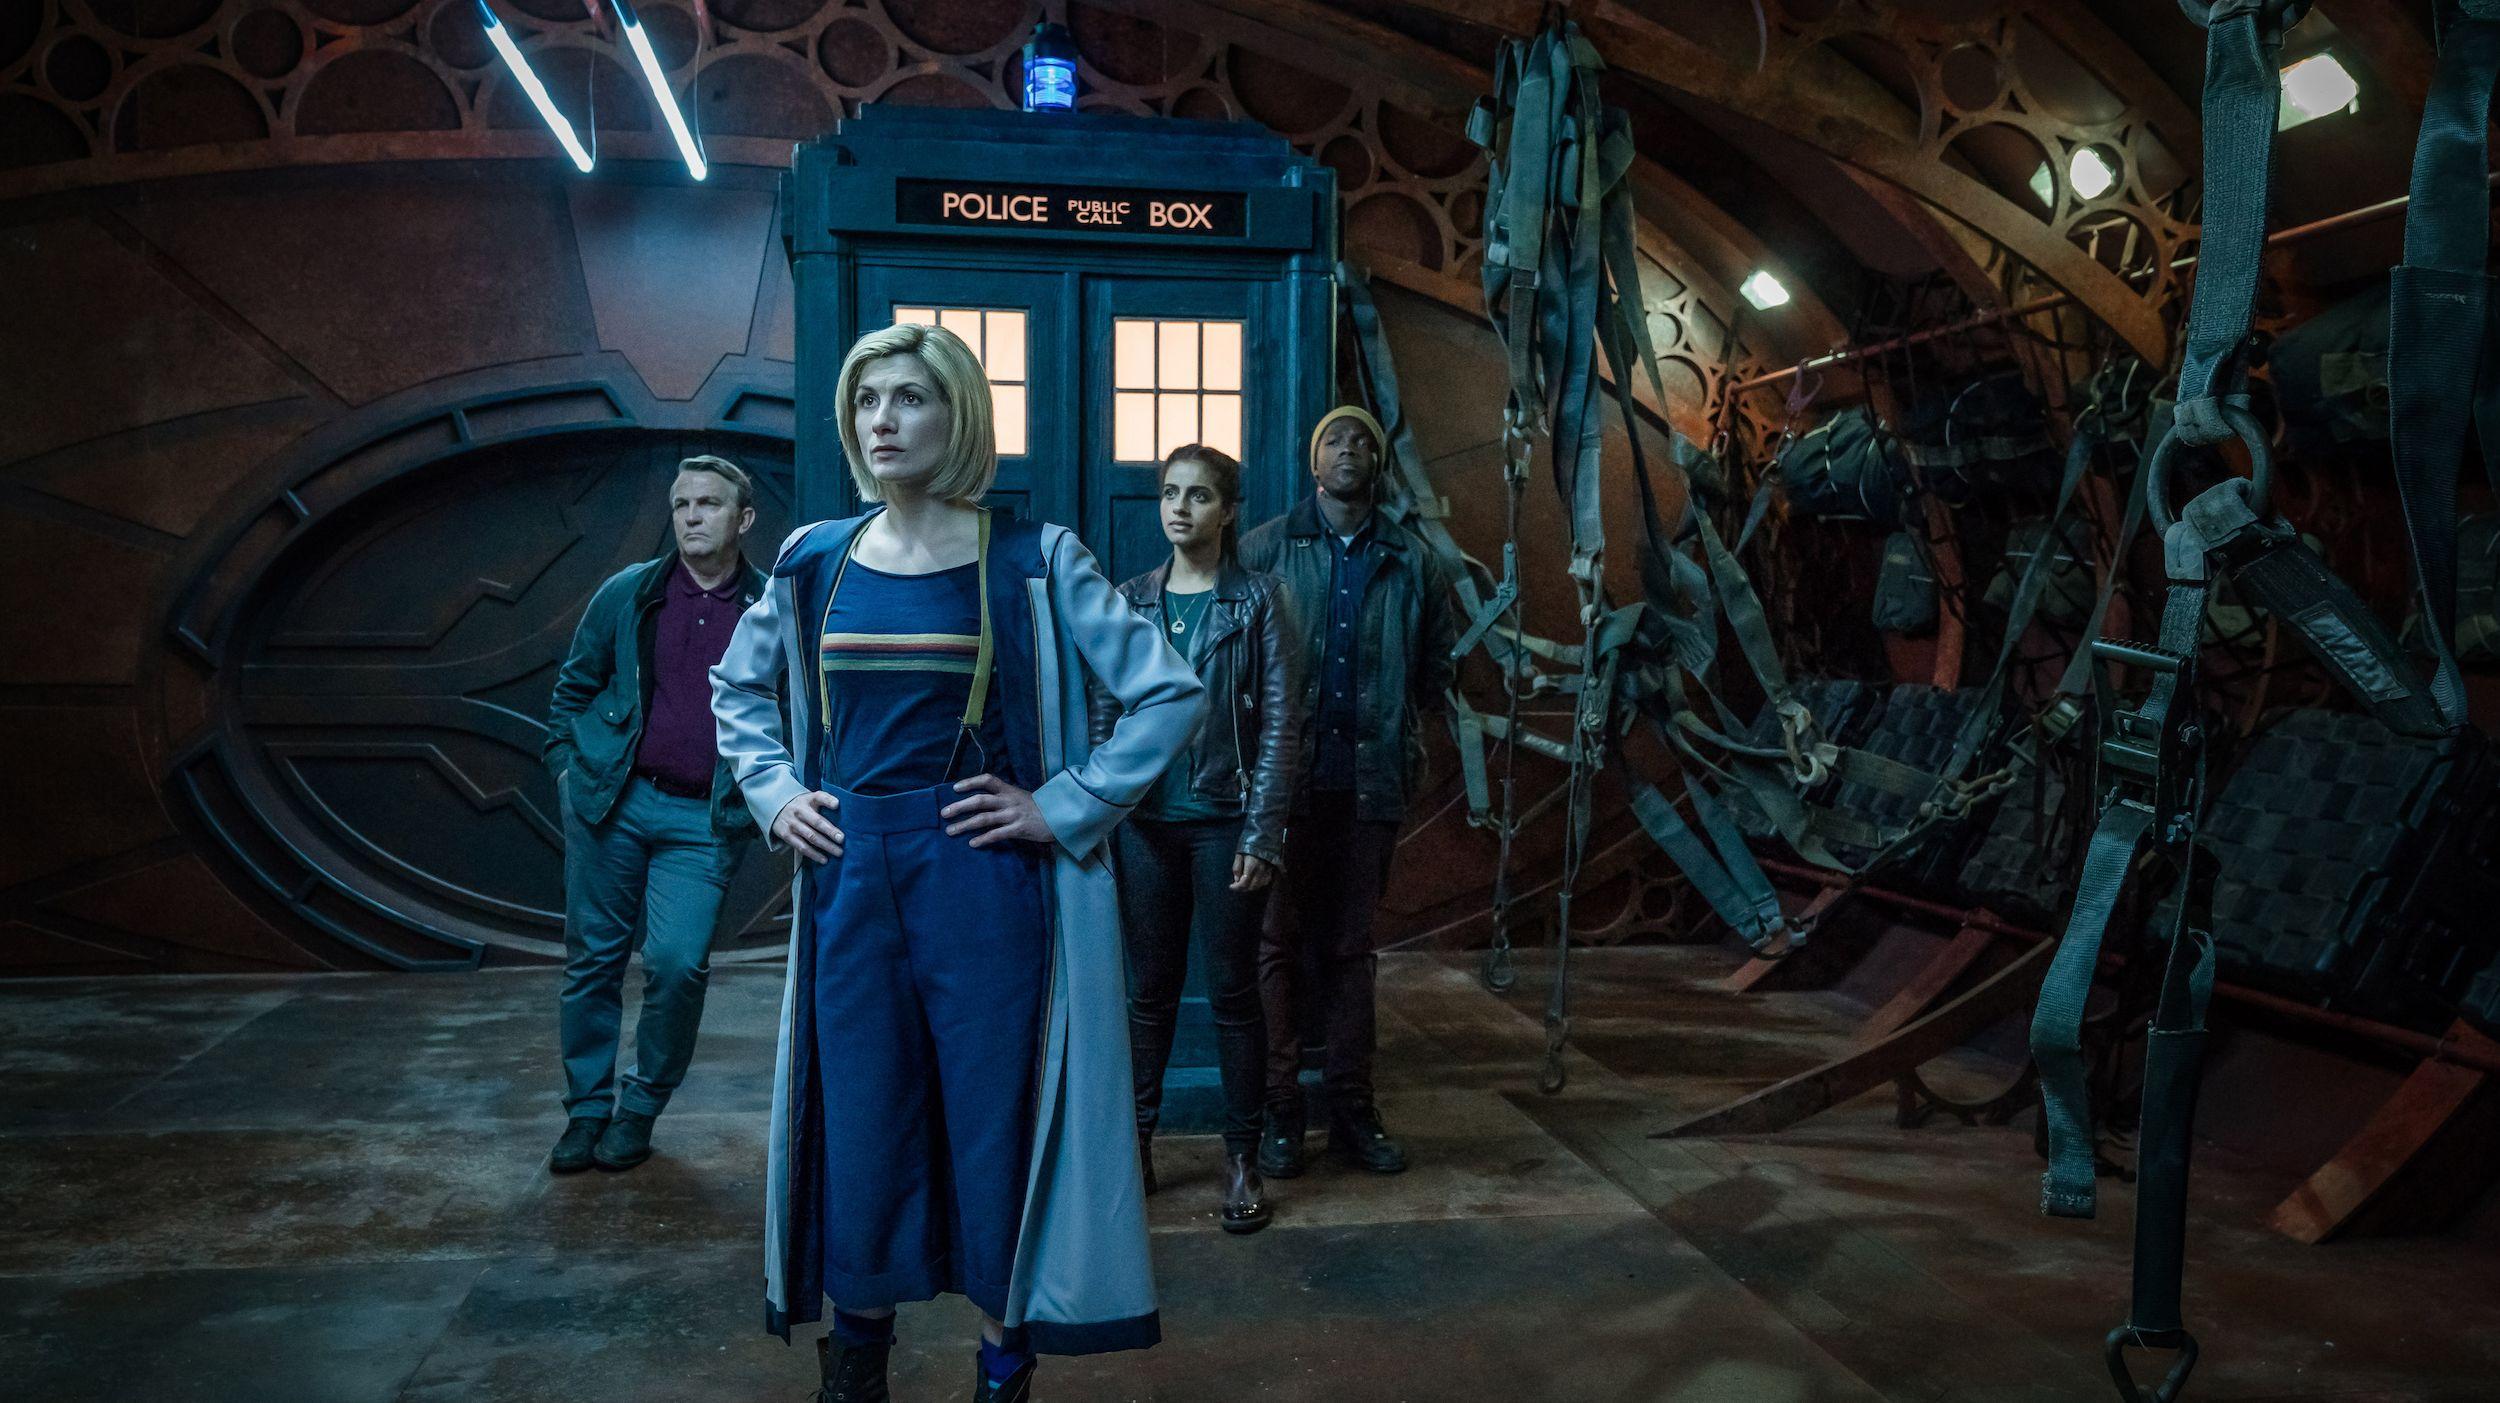 Lywjyb Birdgot Doctor Who Idea Gift Doctor Who Tardis Keychain ...